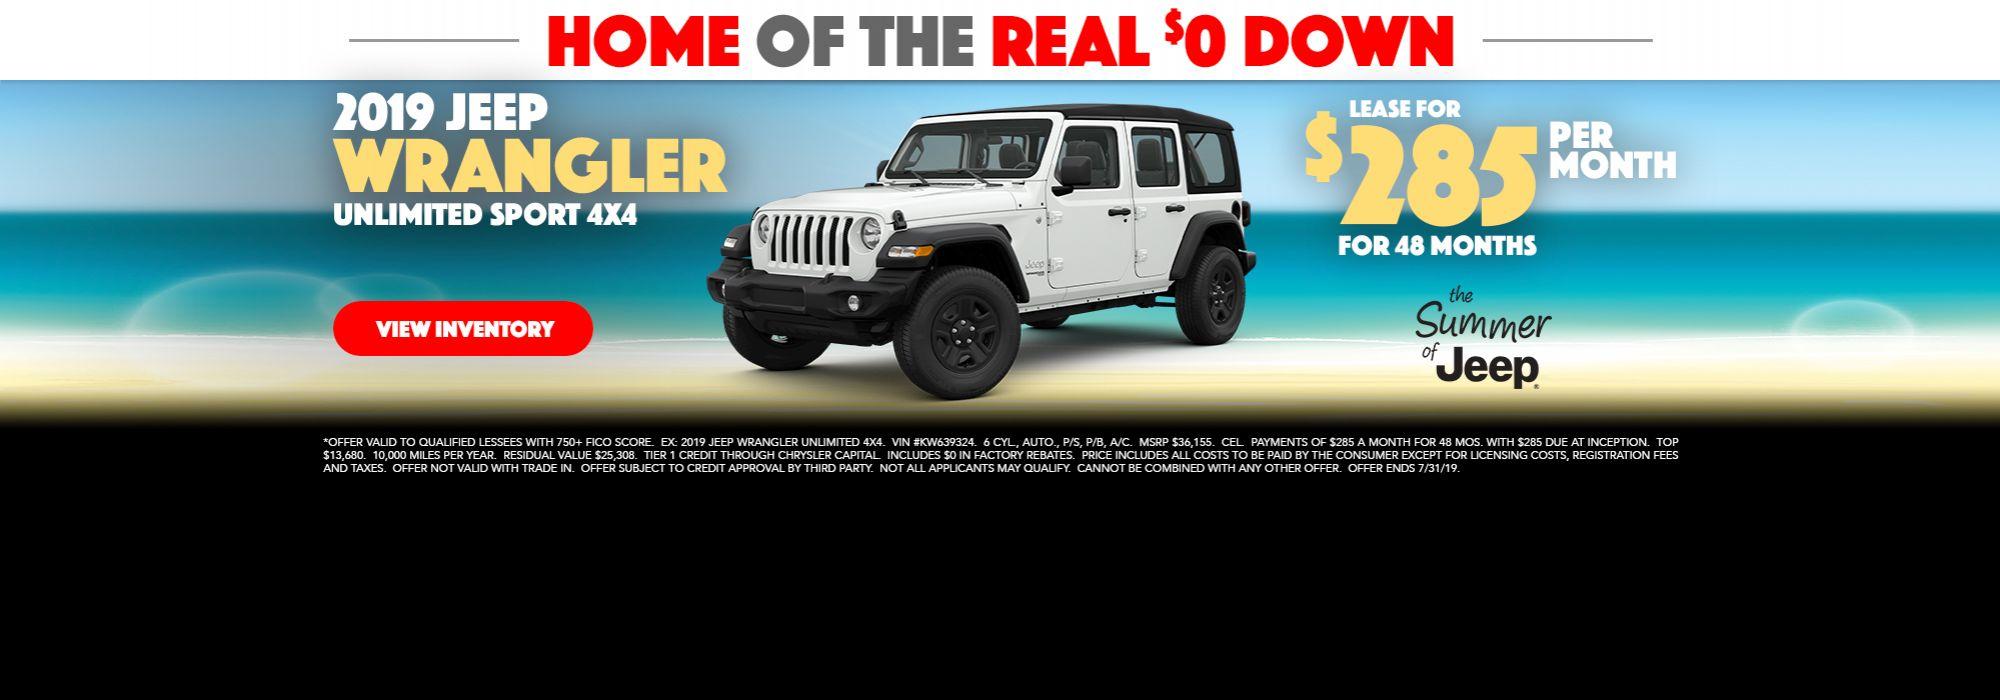 Dodge Dealers In Delaware >> Cherry Hill Dodge Chrysler Jeep Ram Dealer In New Jersey Near